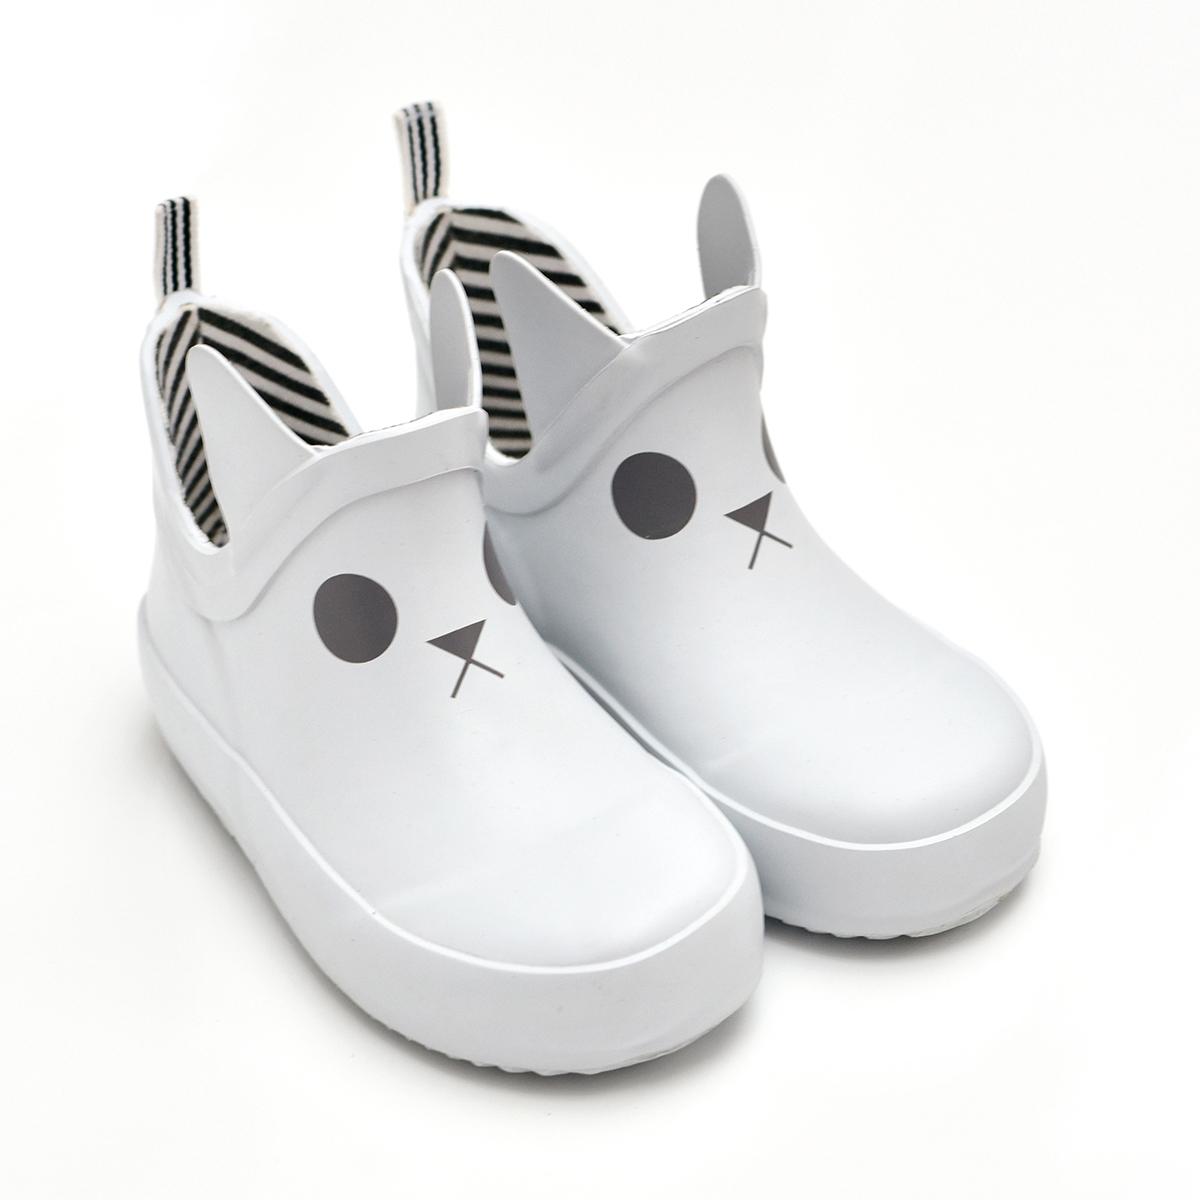 Chaussons & Chaussures Bottines Kerran Blanc - 26 Bottines Kerran Blanc - 26